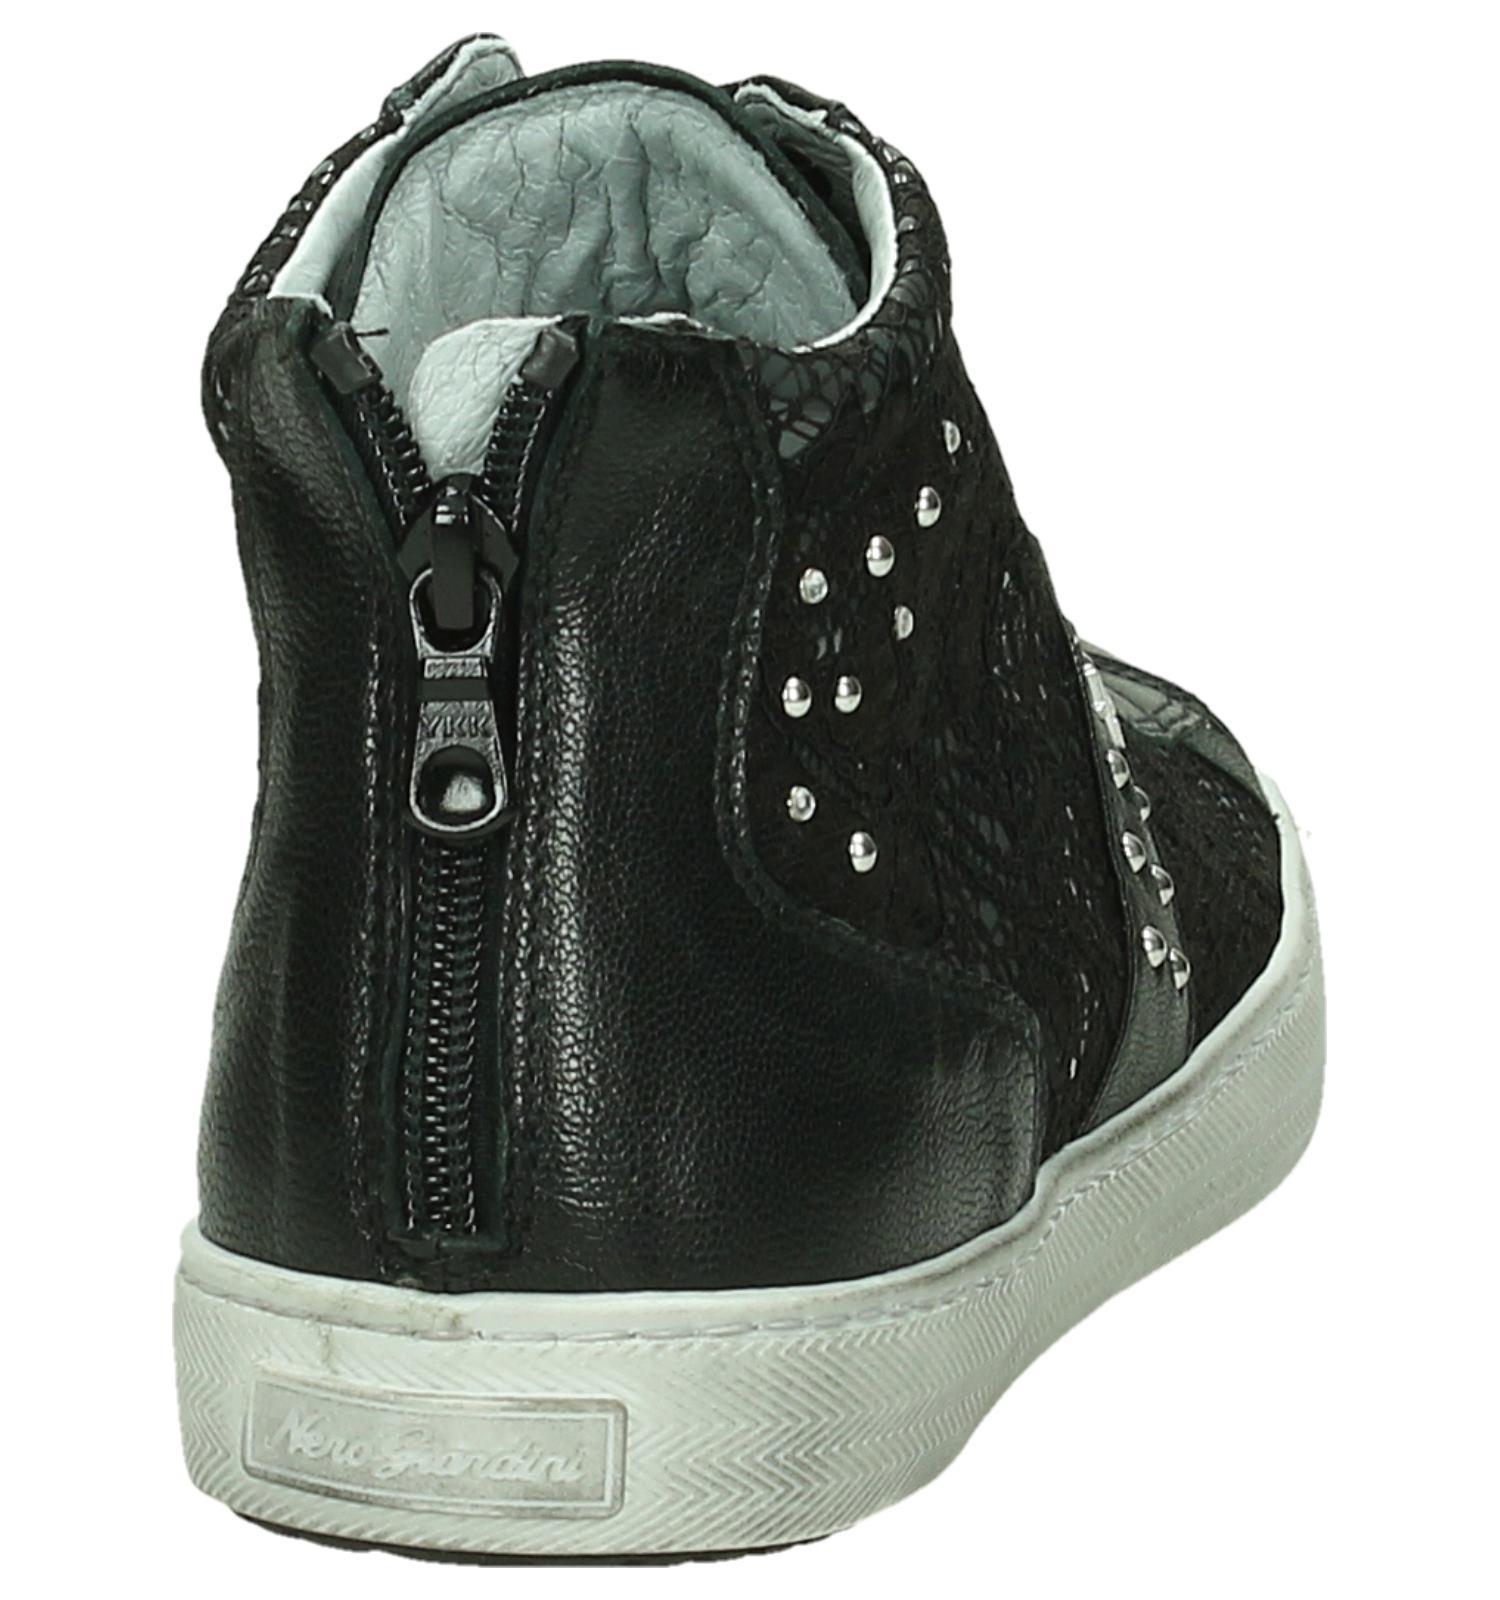 2c18b474dc5 NeroGiardini Hoge Sneaker Zwart met Kant   TORFS.BE   Gratis verzend en  retour